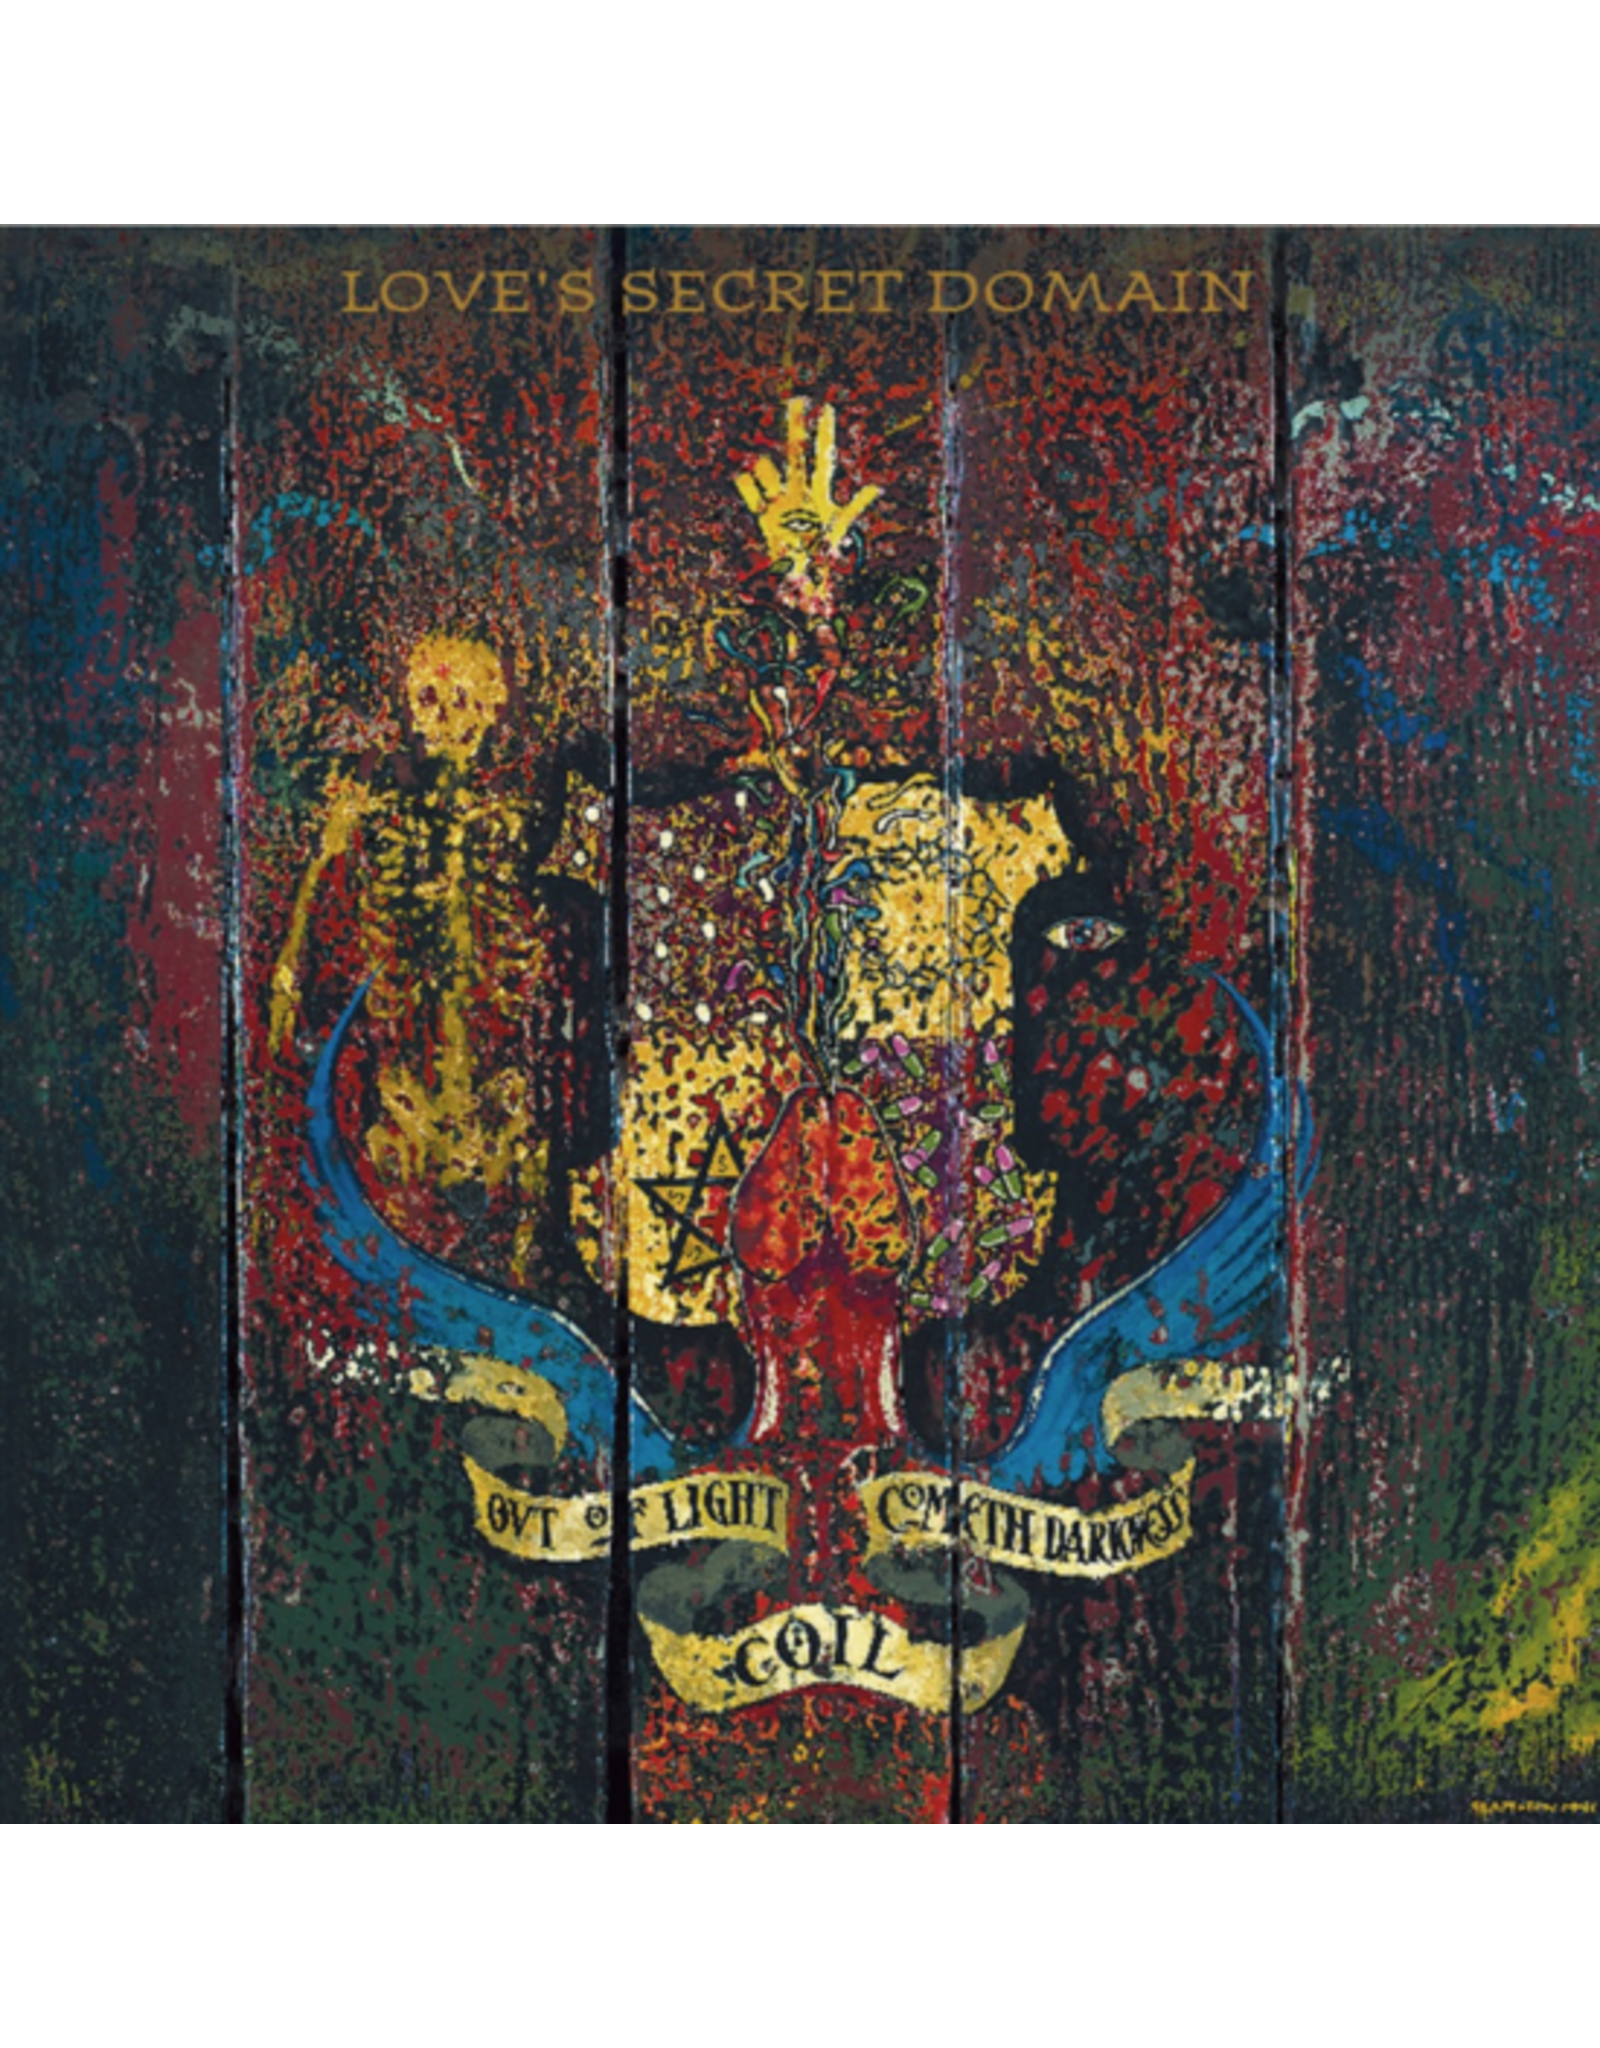 New Vinyl Coil - Love's Secret Domain (30th Anniversary, Colored) 3LP